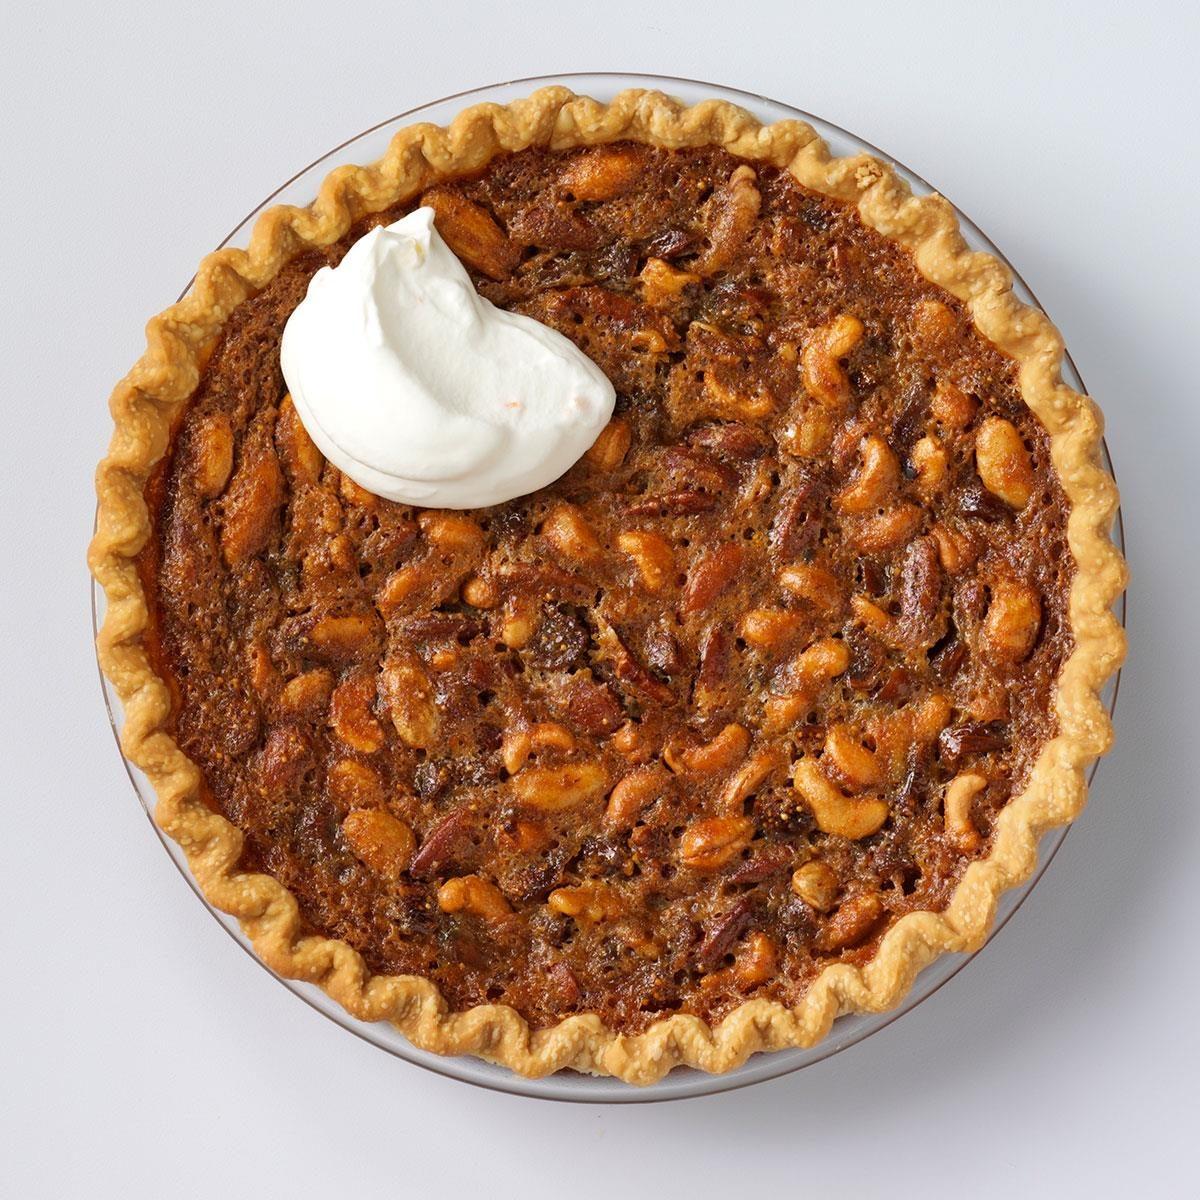 Mixed Nut 'n' Fig Pie